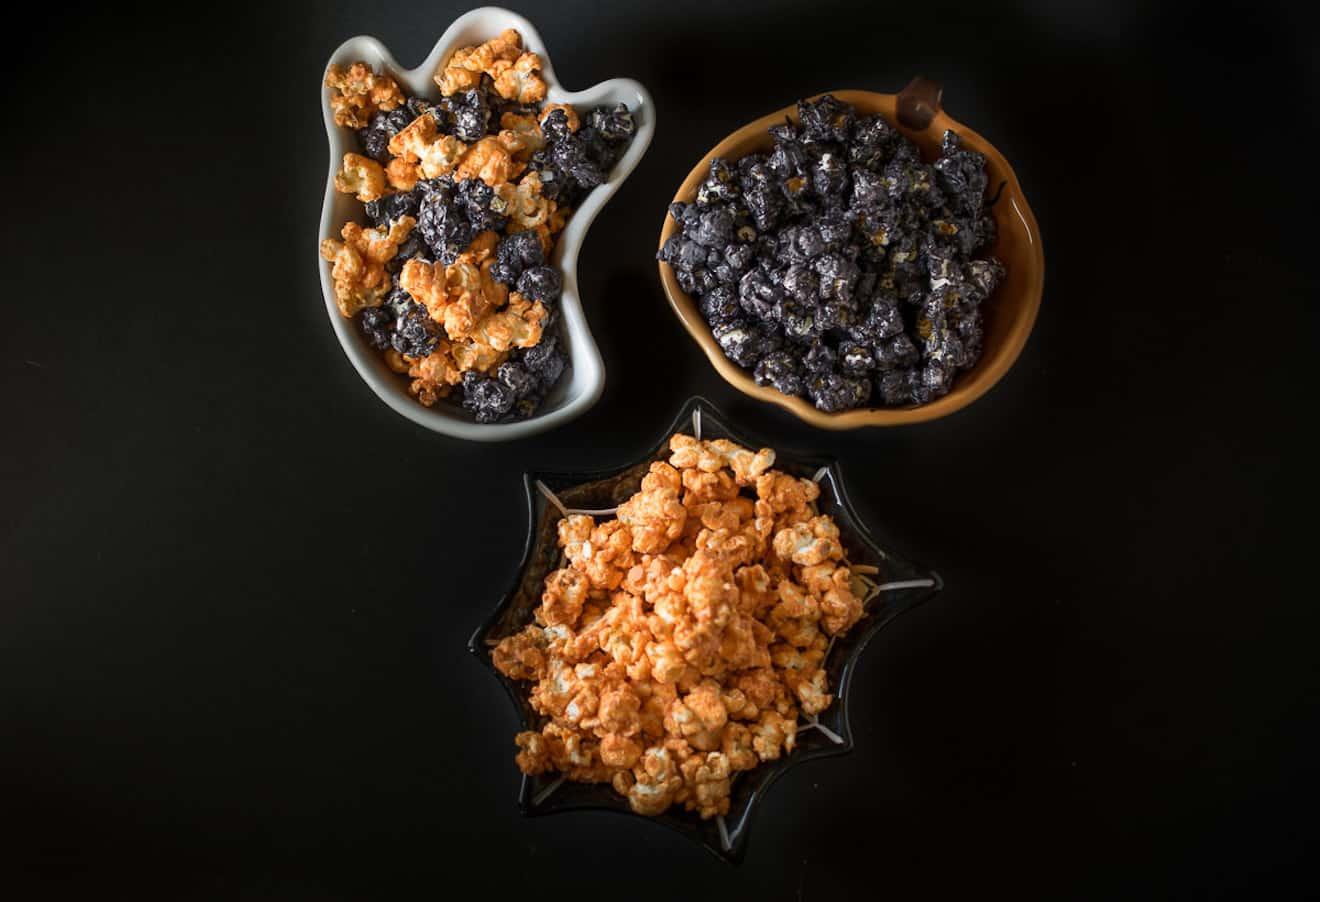 3 bowls of Halloween popcorn, some orange and some black